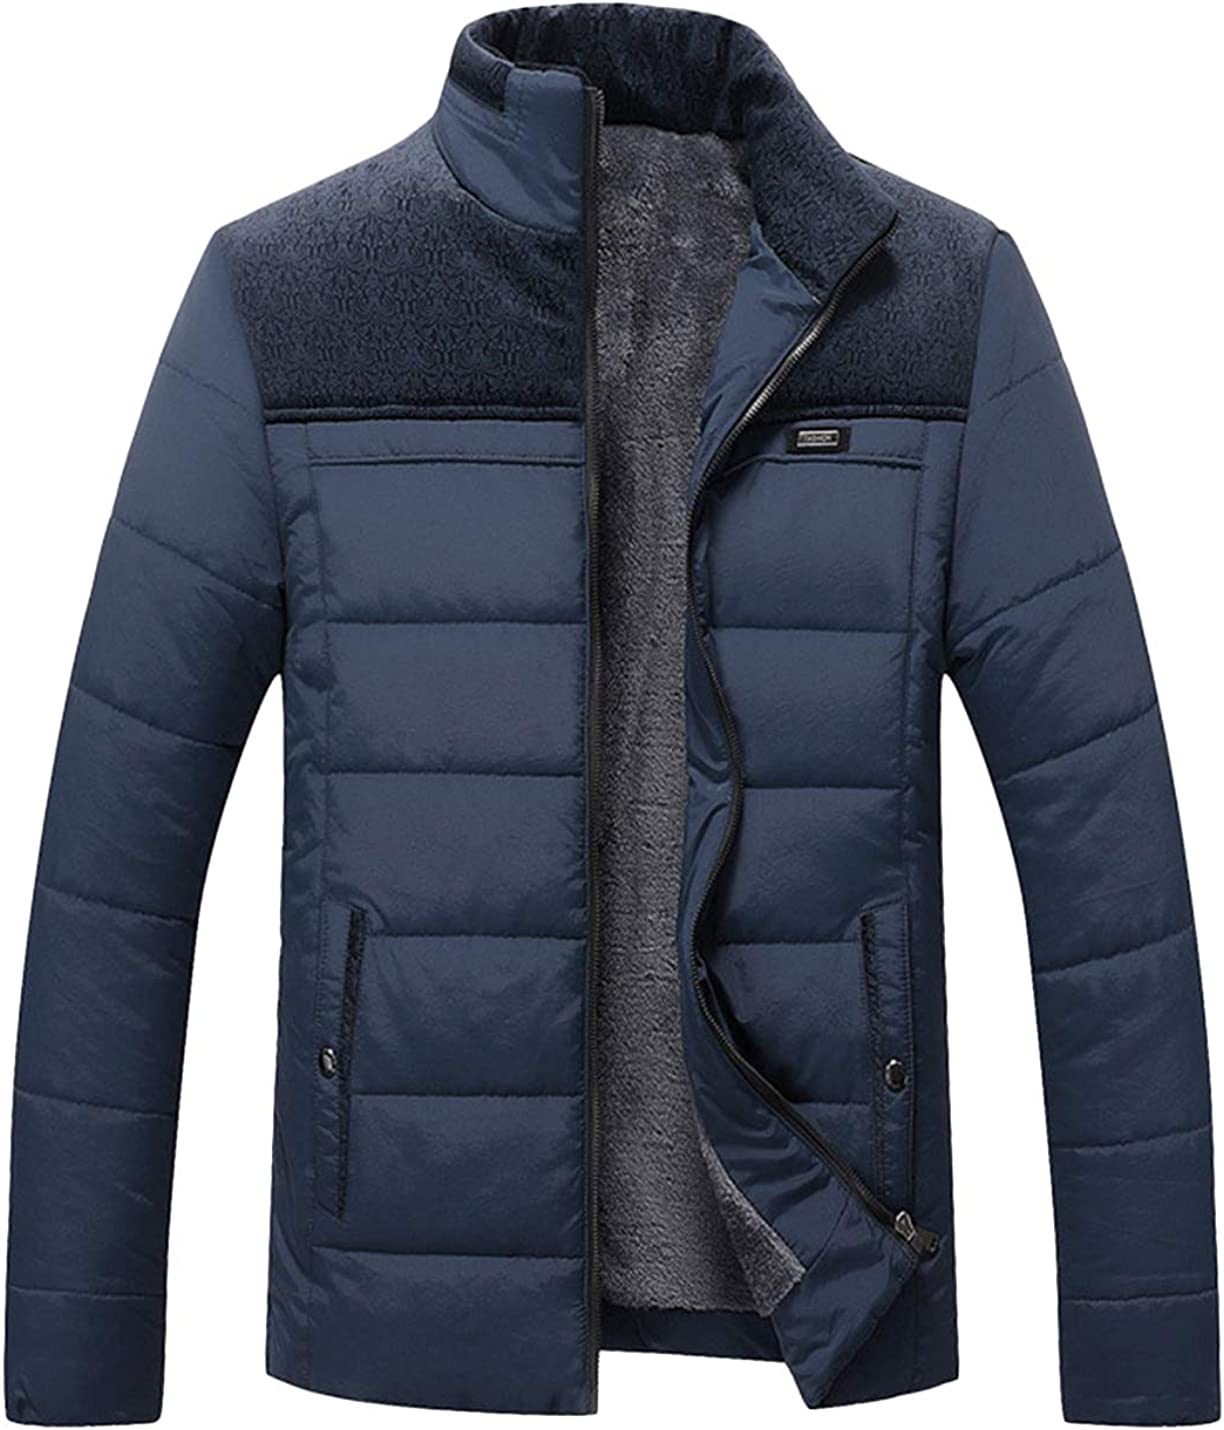 Lentta Men's Business Casual Zip Up Down Cotton Padded Jacket Coat Windbreaker